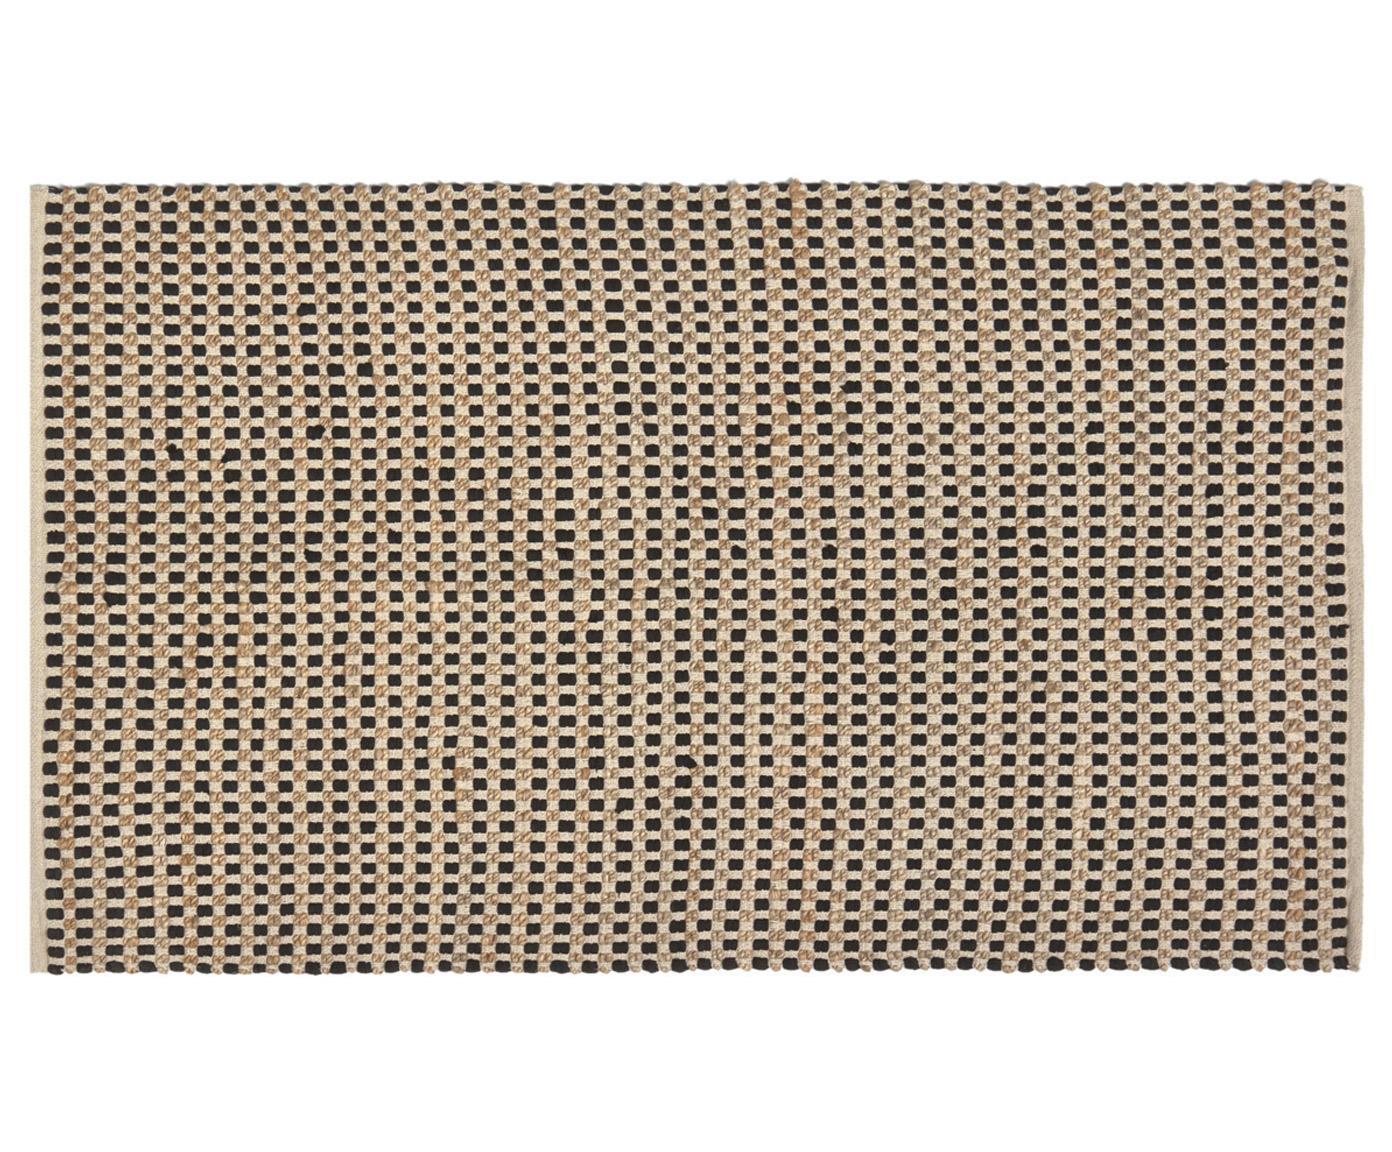 Felpudo de yute y algodón Fiesta, 55%algodón Chindi , 45%yute, Negro, beige, An 45 x L 75 cm